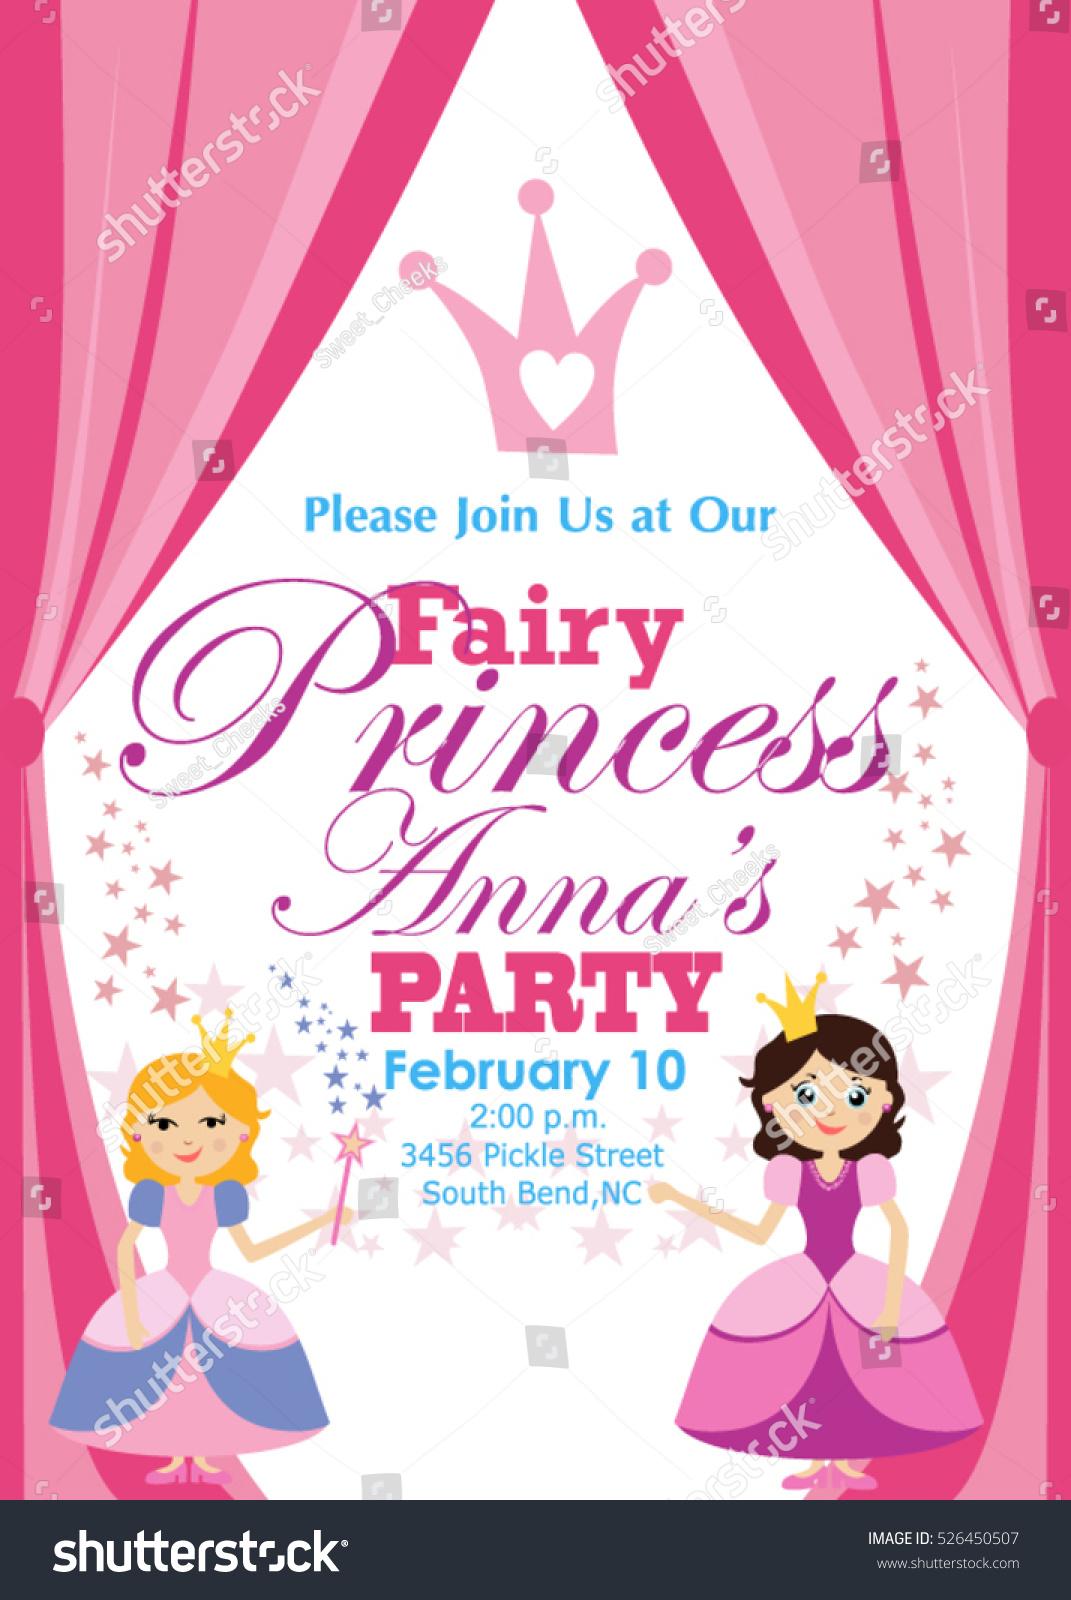 Princess Party Invitation Stock Vector 526450507 - Shutterstock